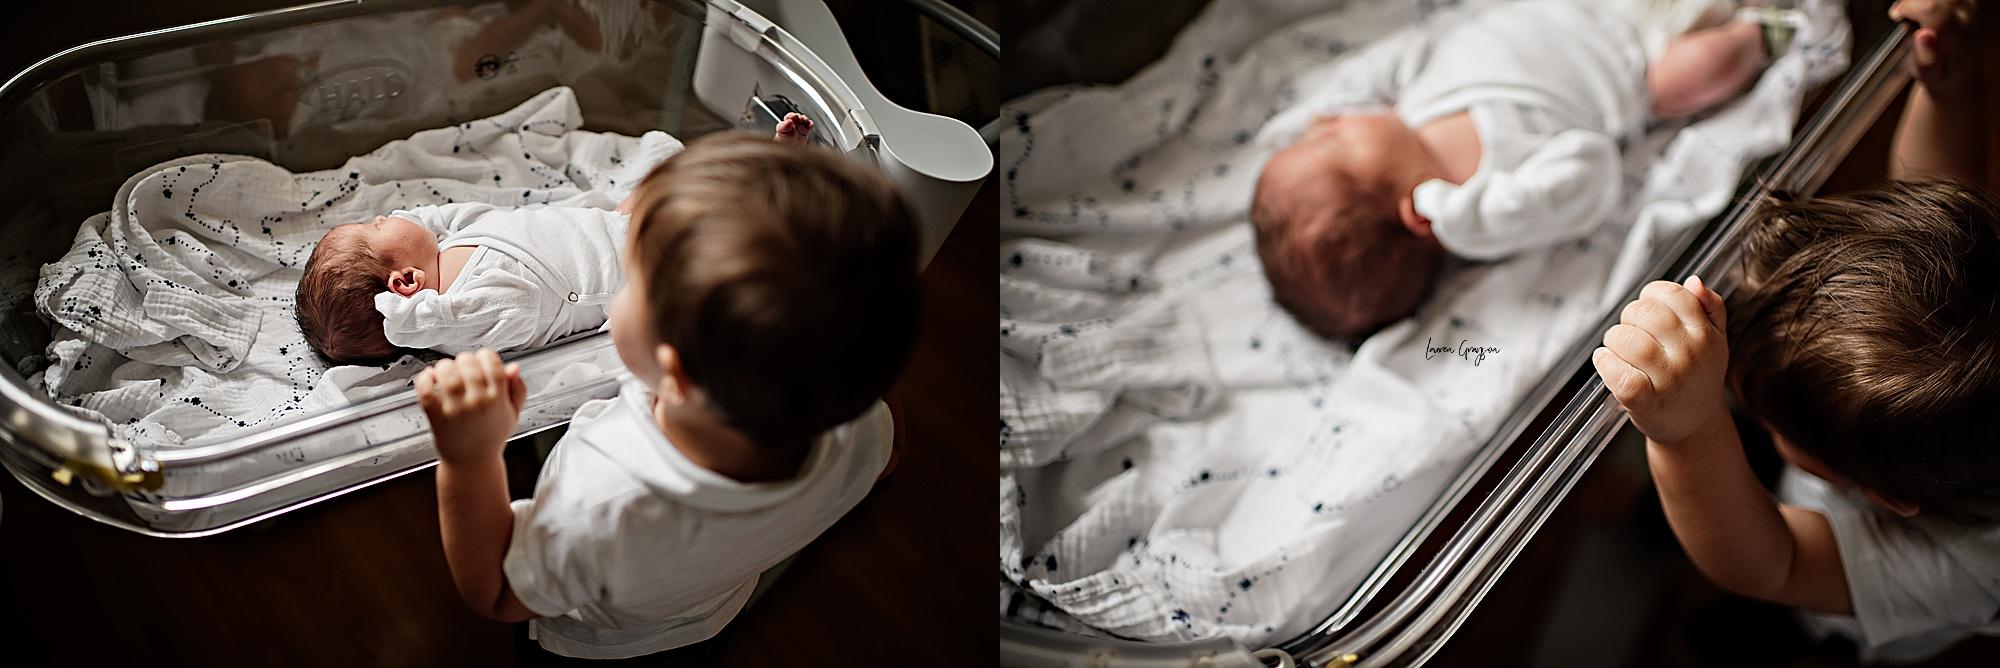 lauren-grayson-photography-akron-ohio-newborn-fresh-48-session-joshua_0004.jpg